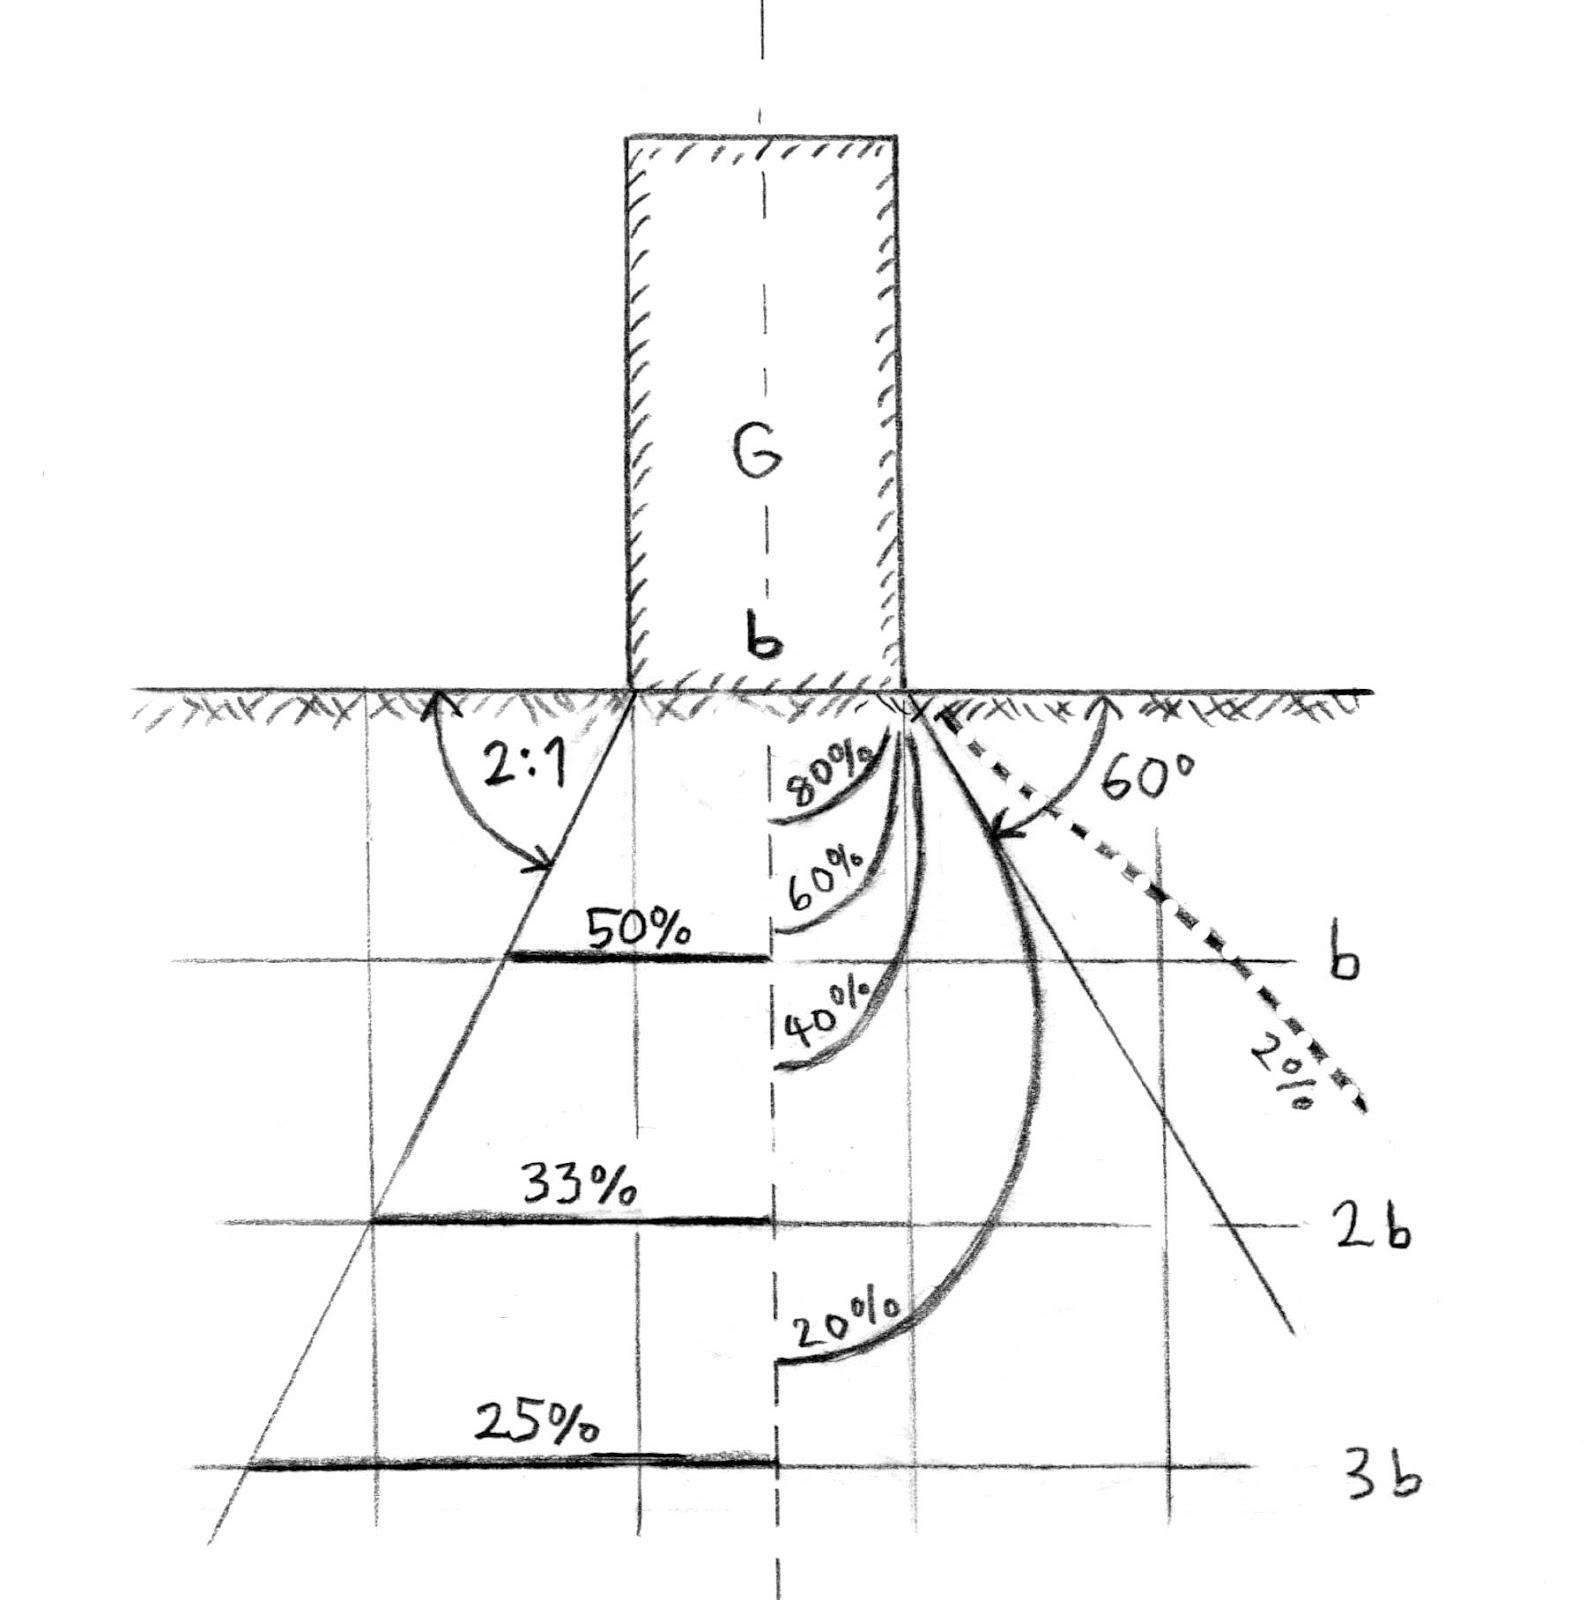 streifenfundament lastausbreitung gestaltungsinspiration. Black Bedroom Furniture Sets. Home Design Ideas